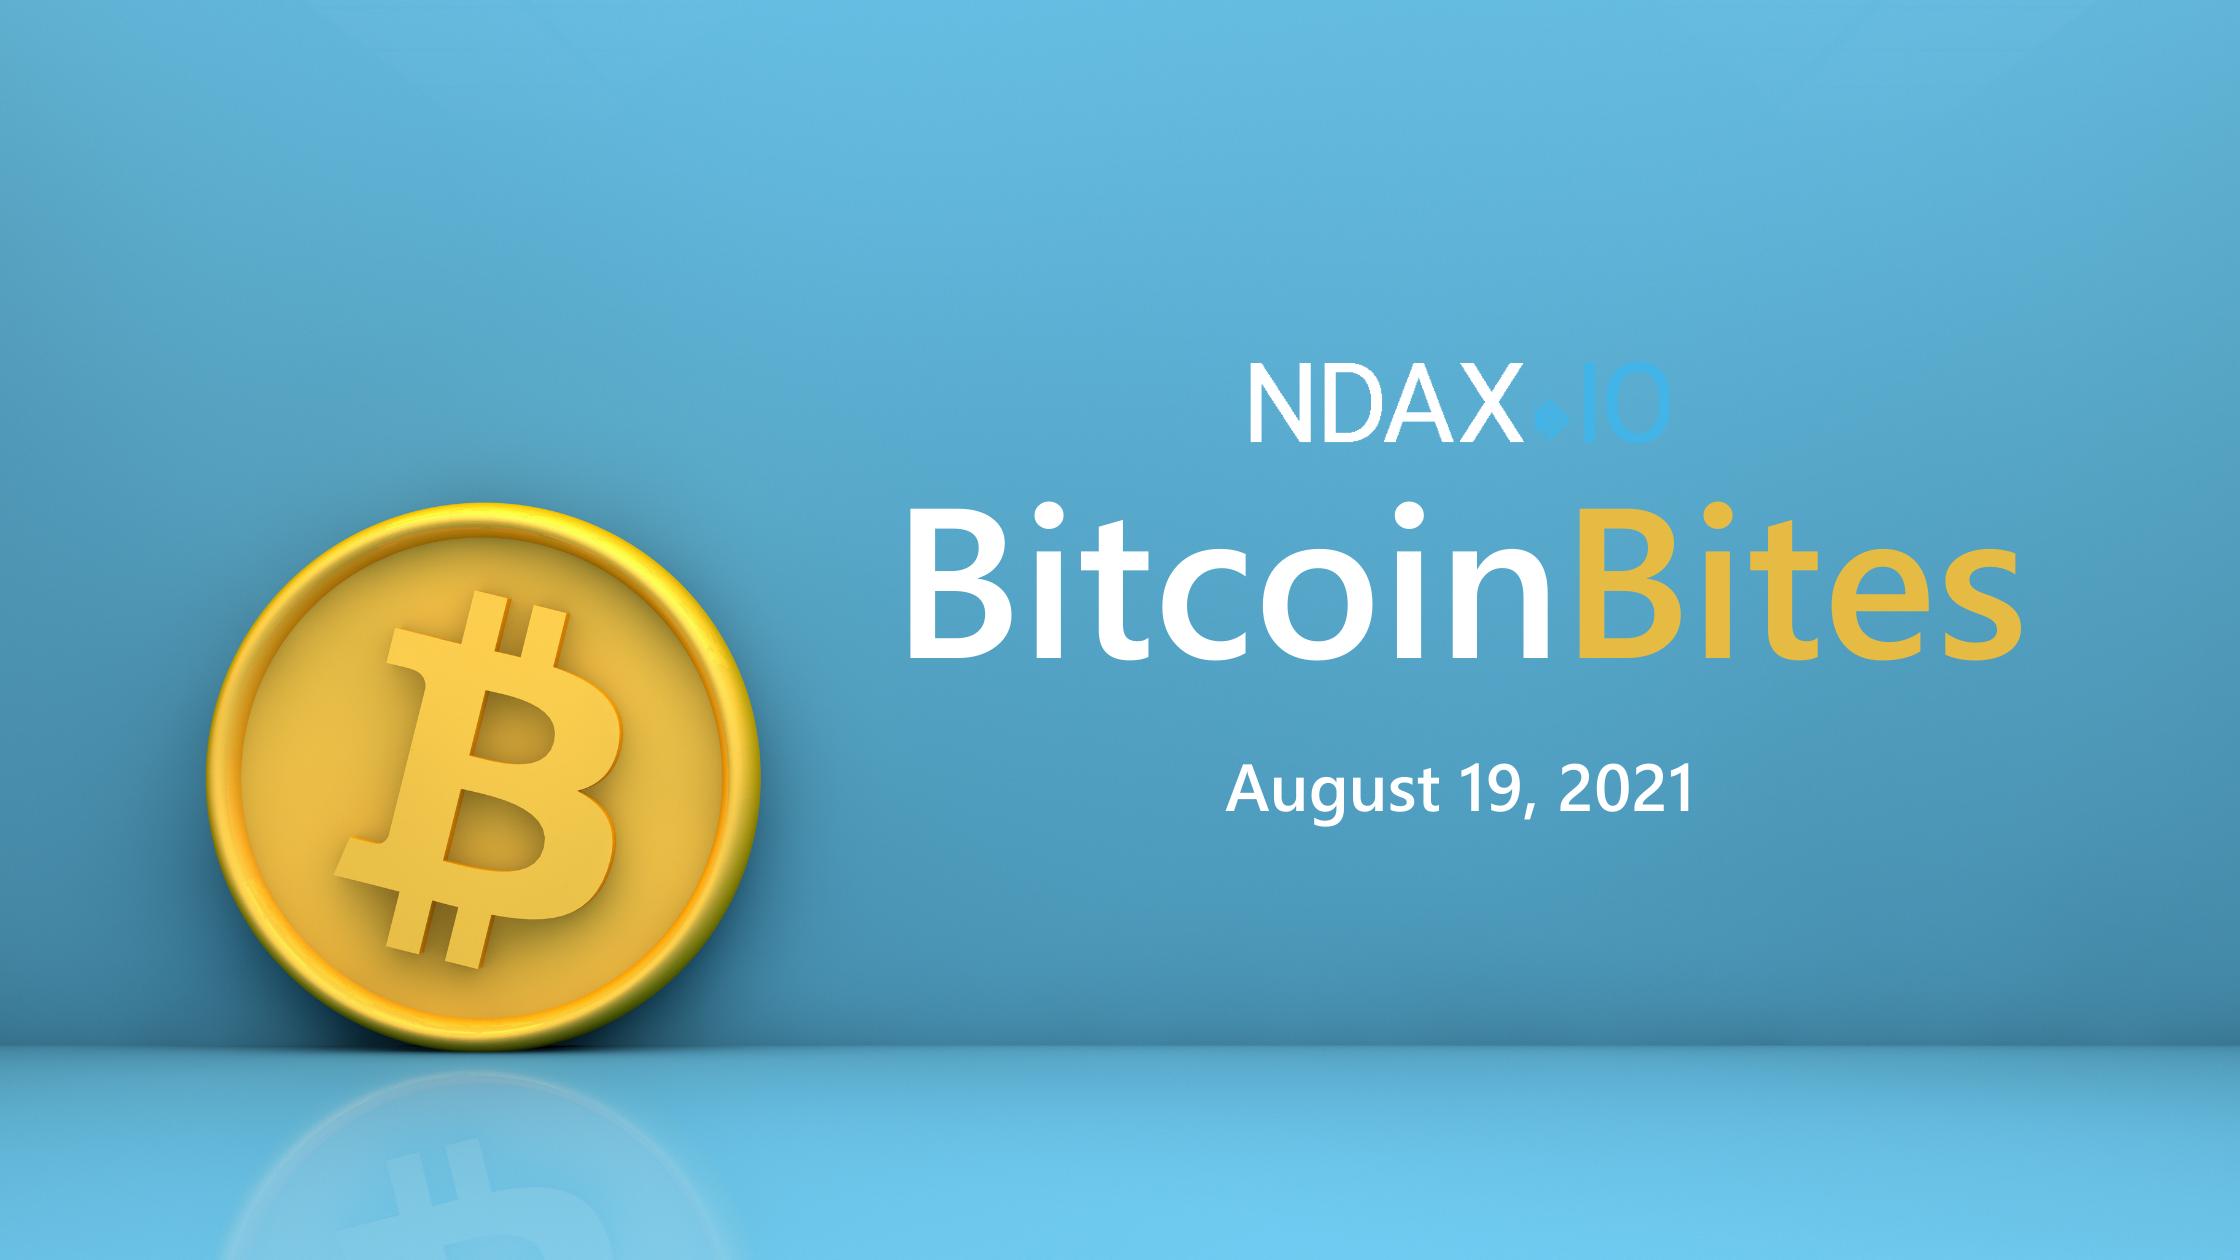 Bitcoin Bites: 5 BTC stories you should know - August 19, 2021